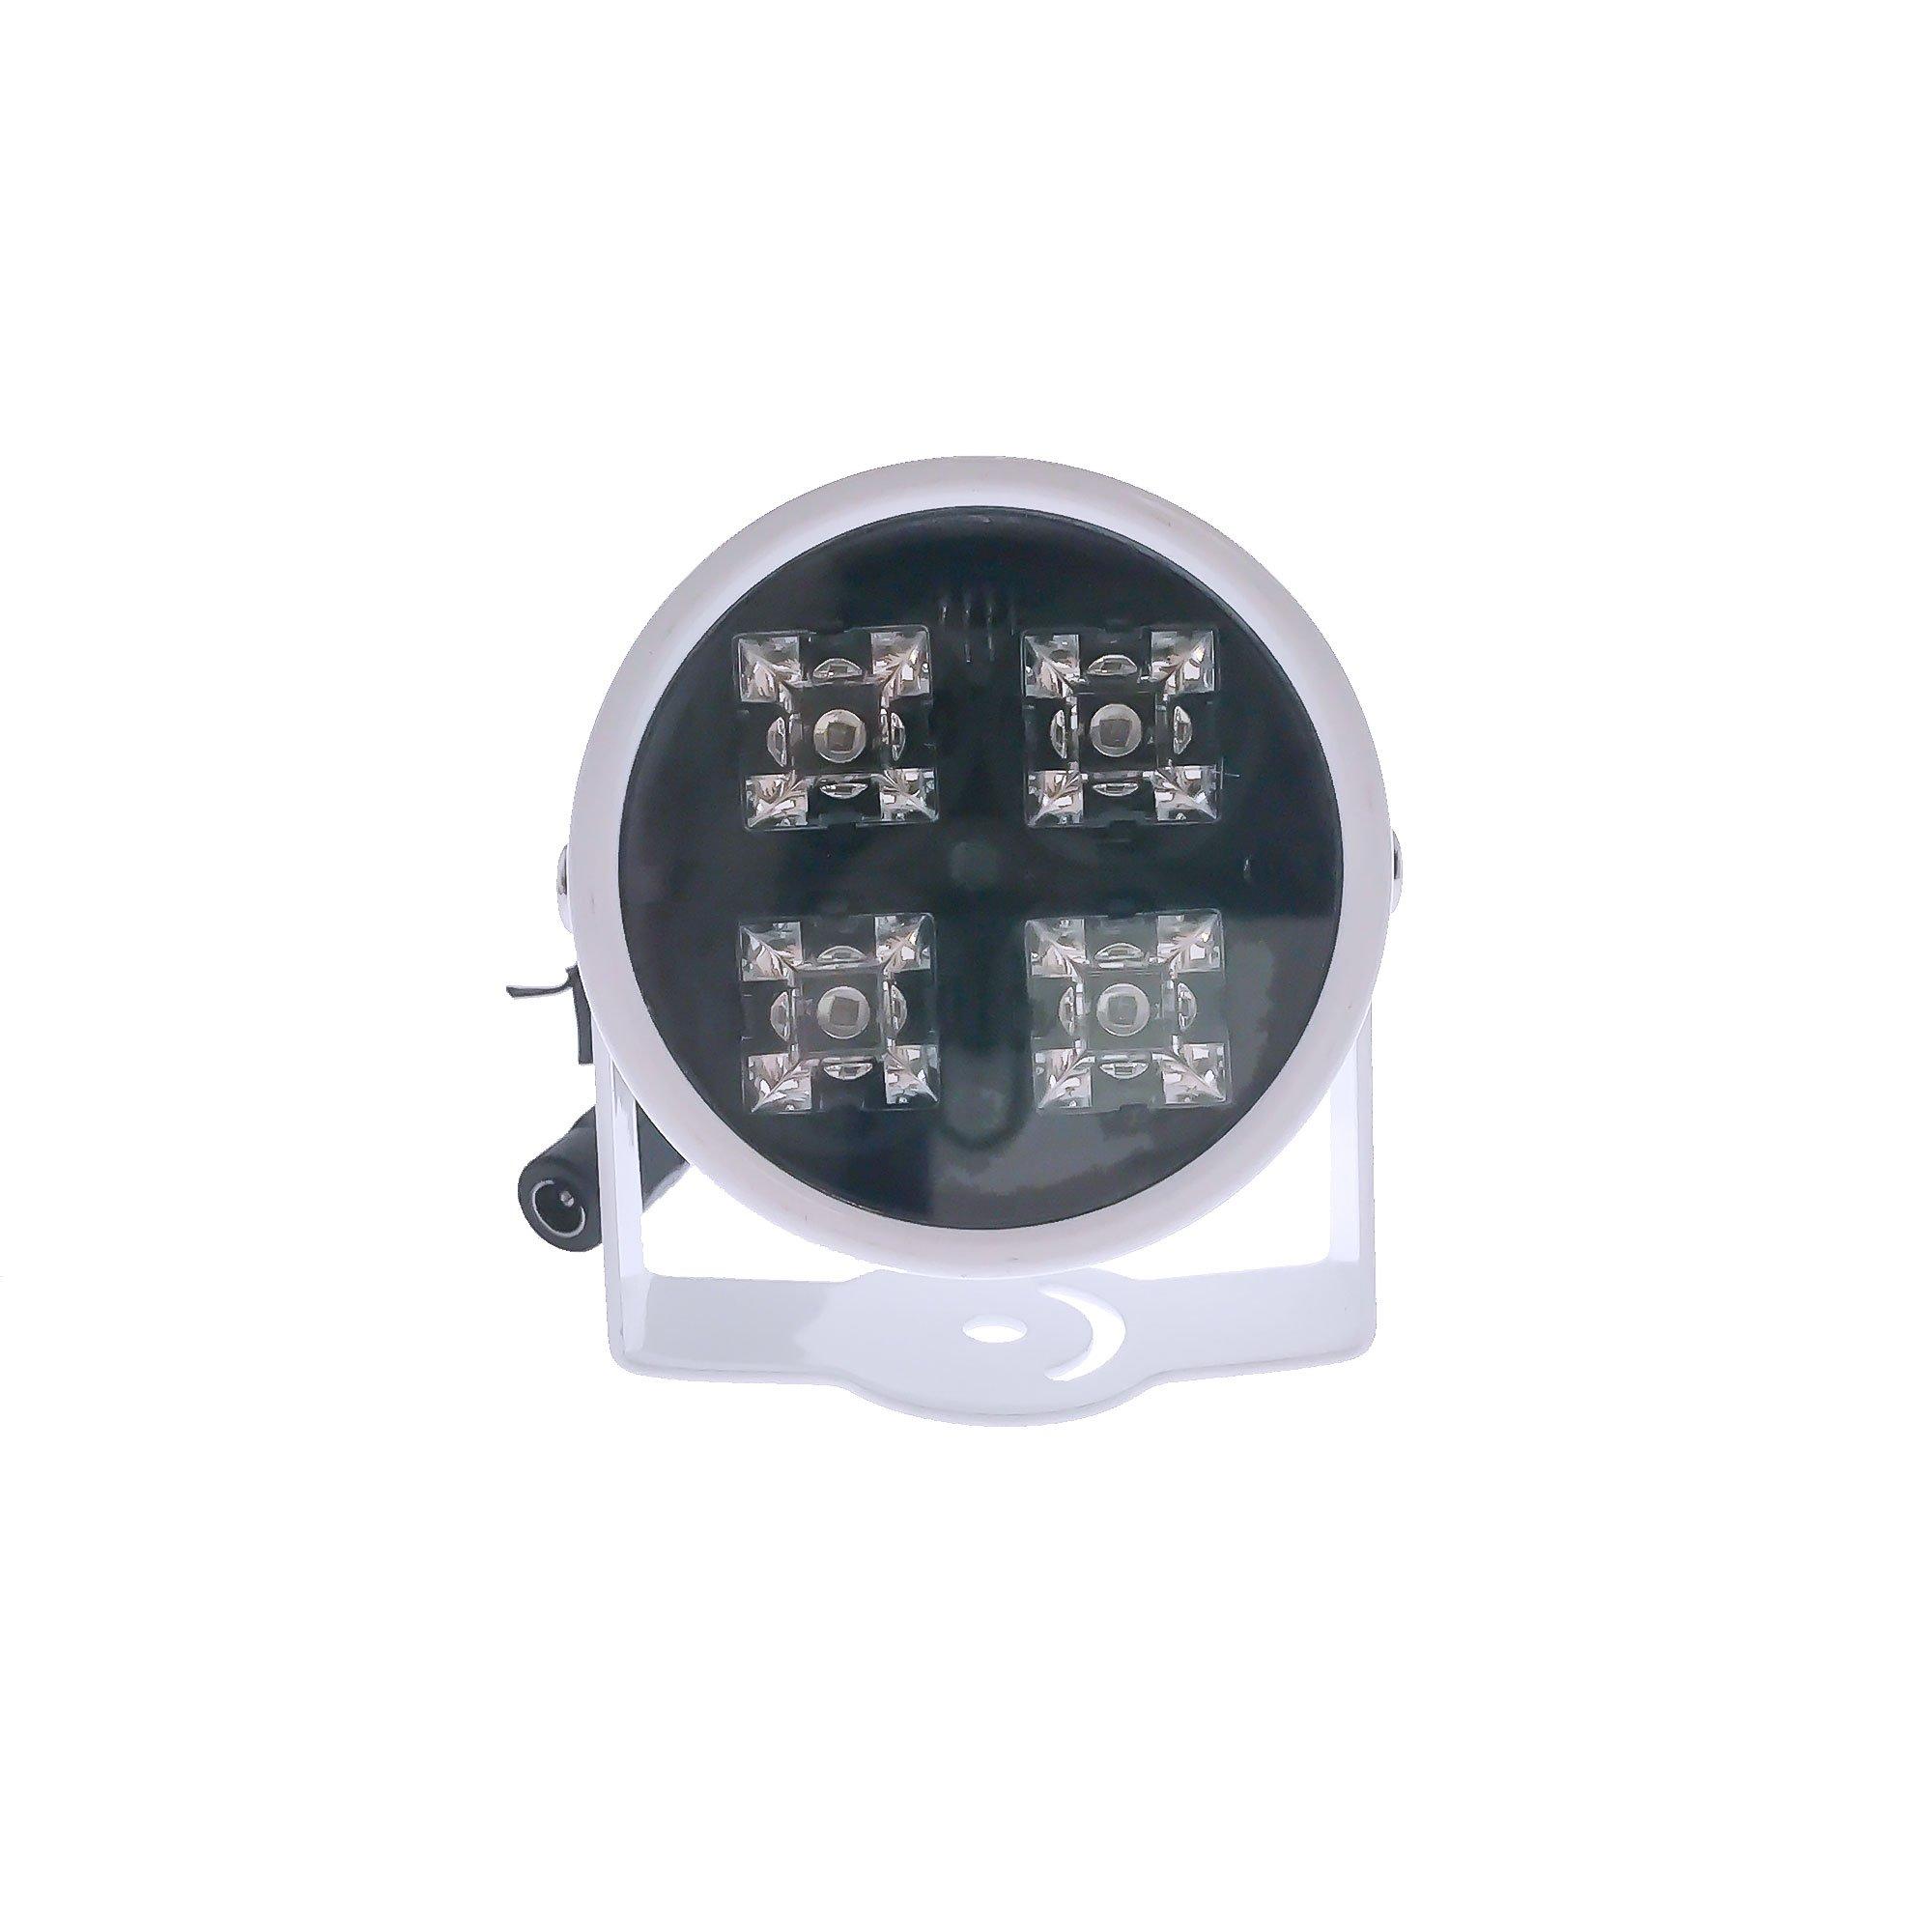 CMVision IR40 WideAngle 60-80 Degree 4pc Power LED 100feet Long Range Indoor/ourdoor IR Array Illuminator